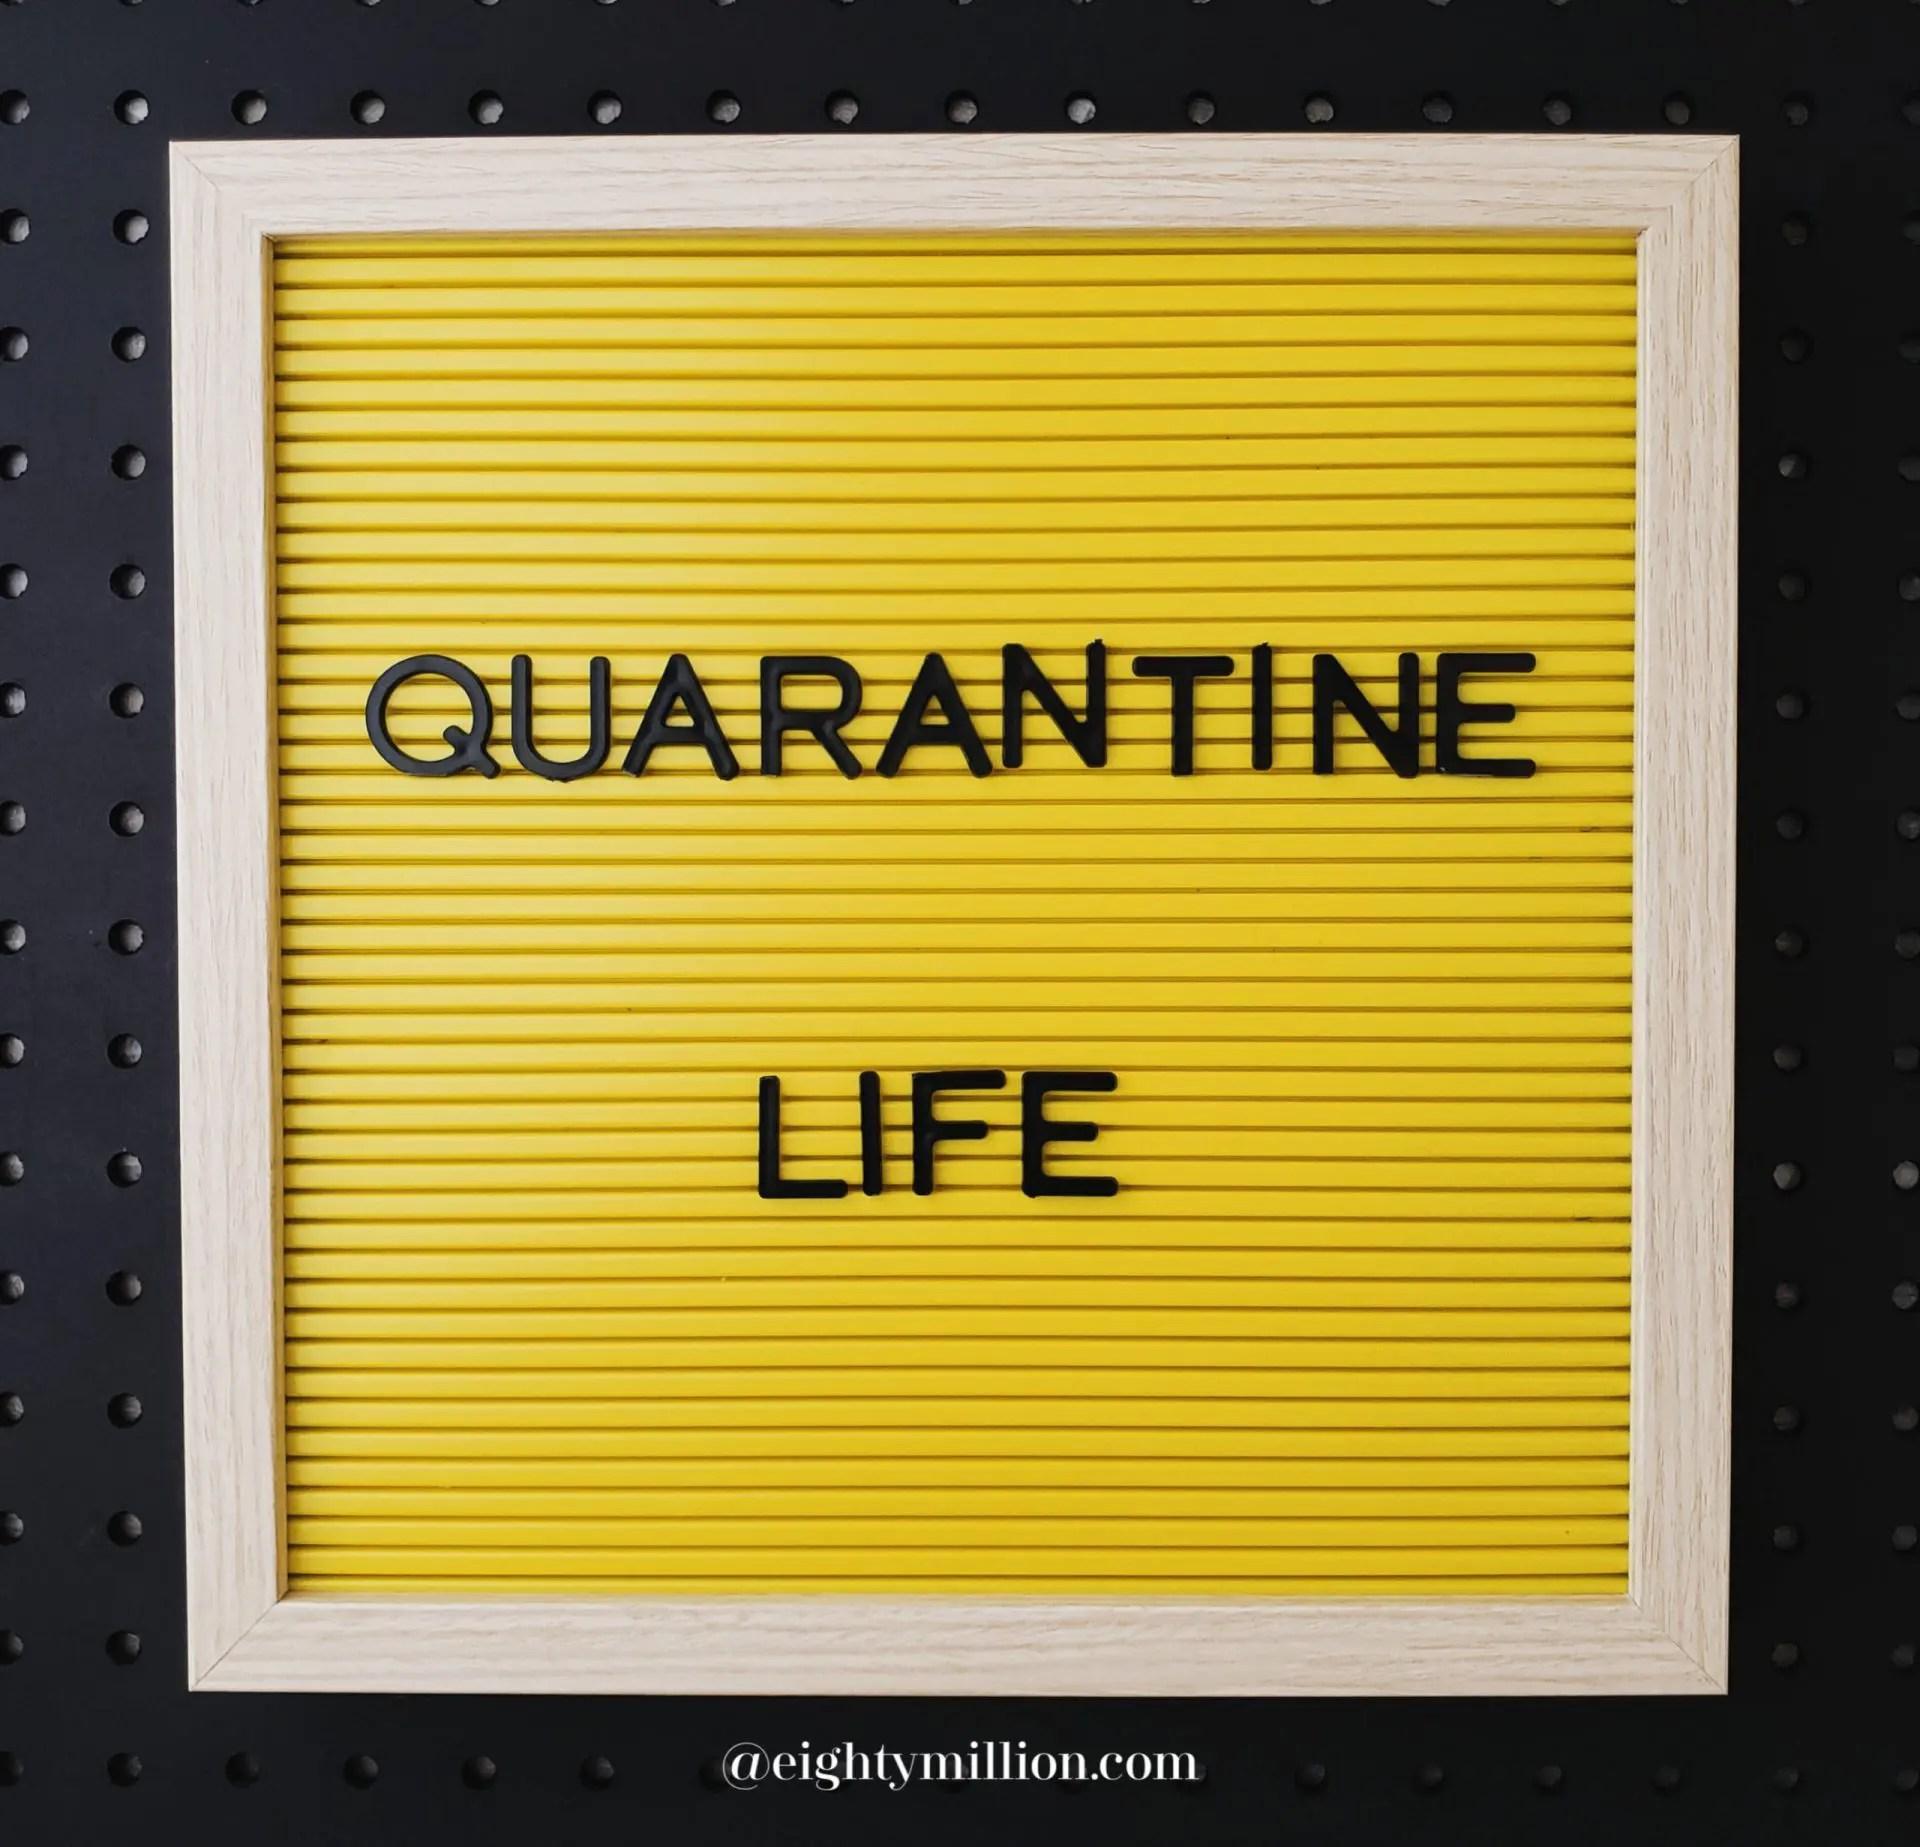 Quarantine Life 2020 Eightymillion